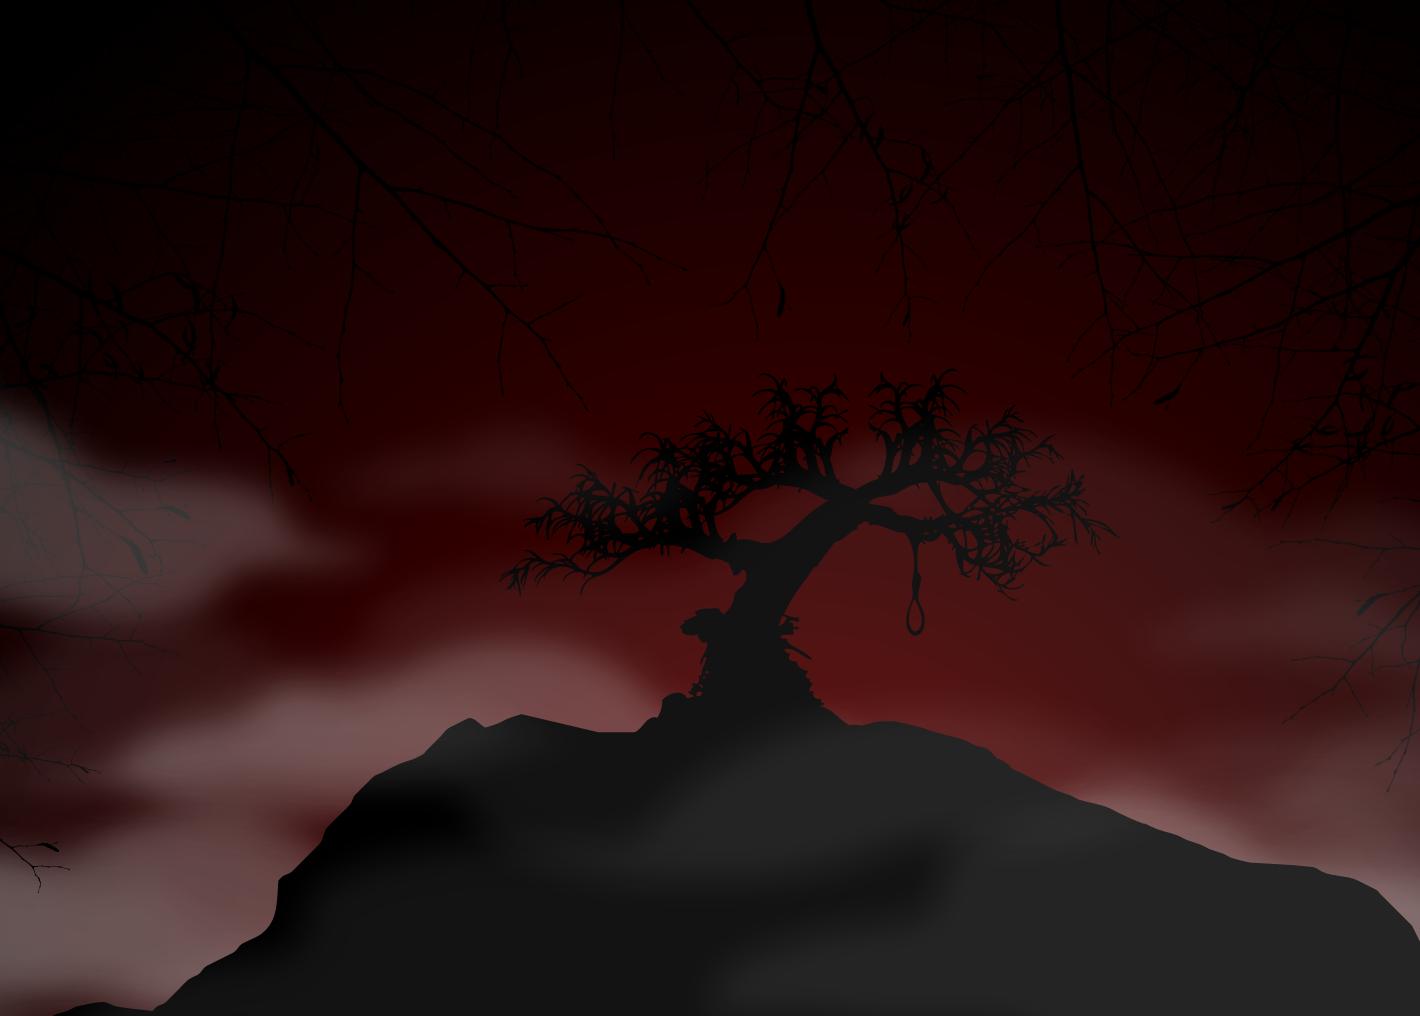 Download this animated free halloween powerpoint template with a download this animated free halloween powerpoint template with a hanging tree at night toneelgroepblik Images